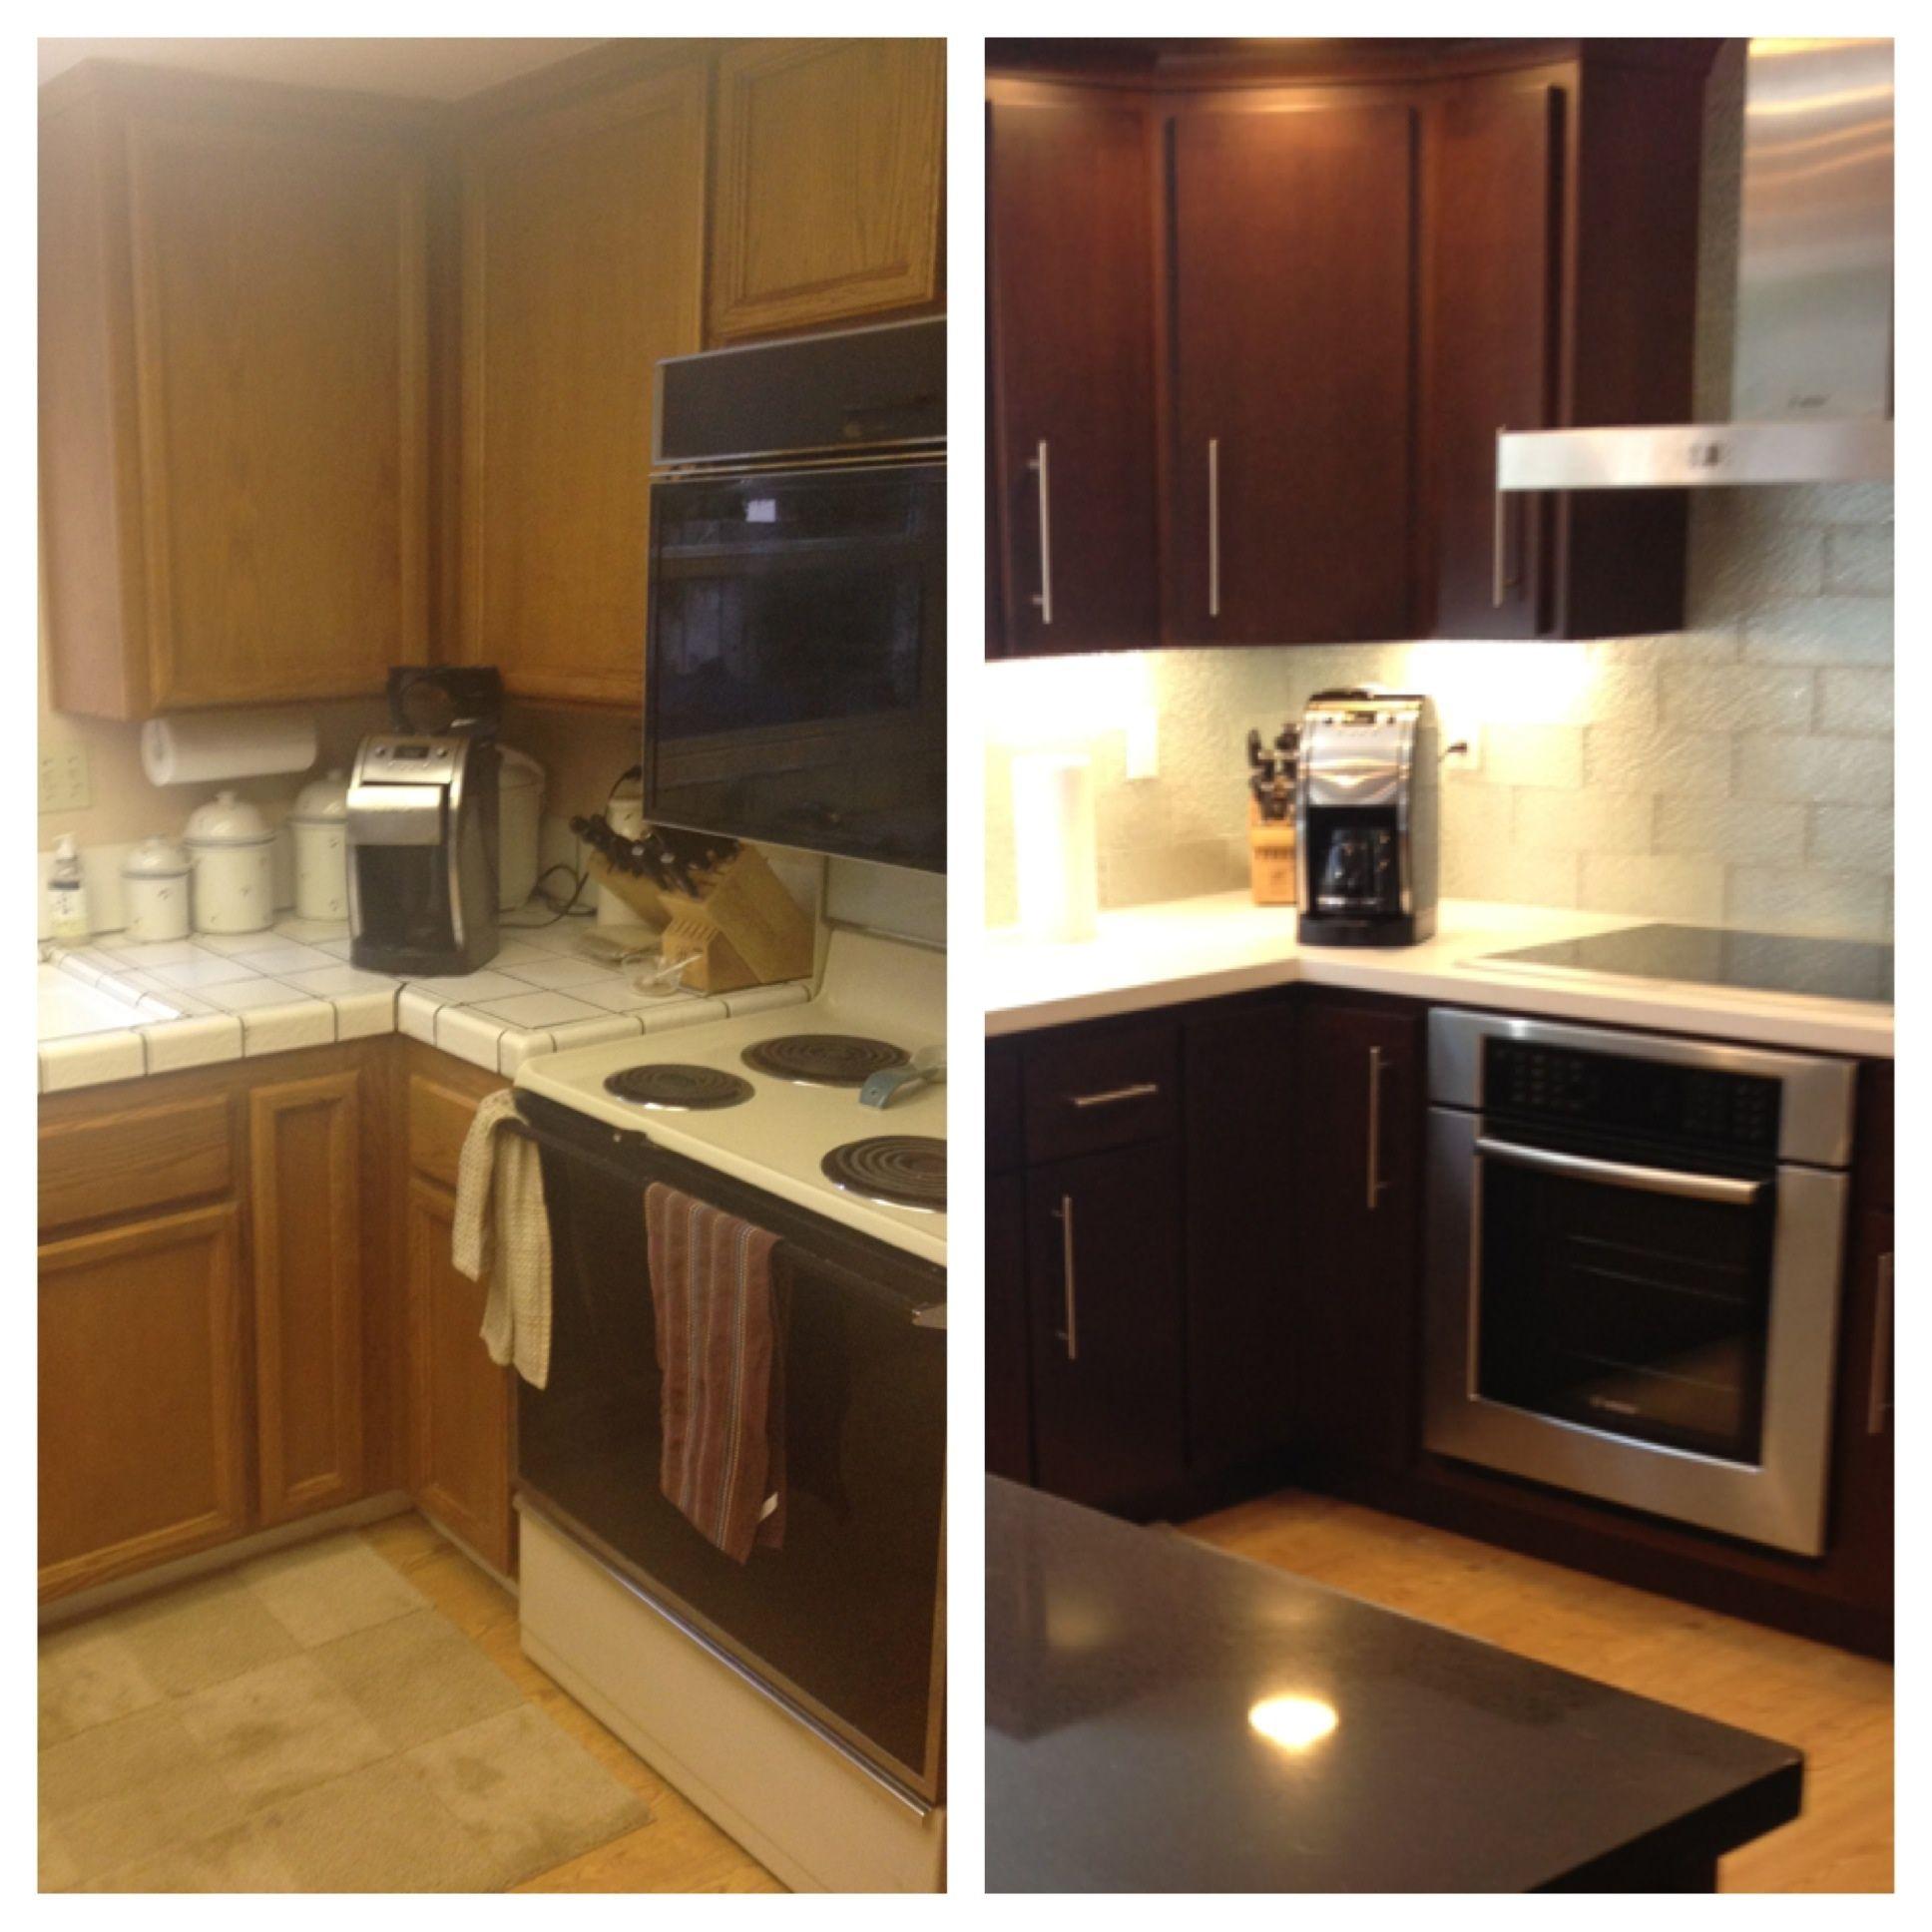 kitchen remodels before and after katana knife remodel makeover